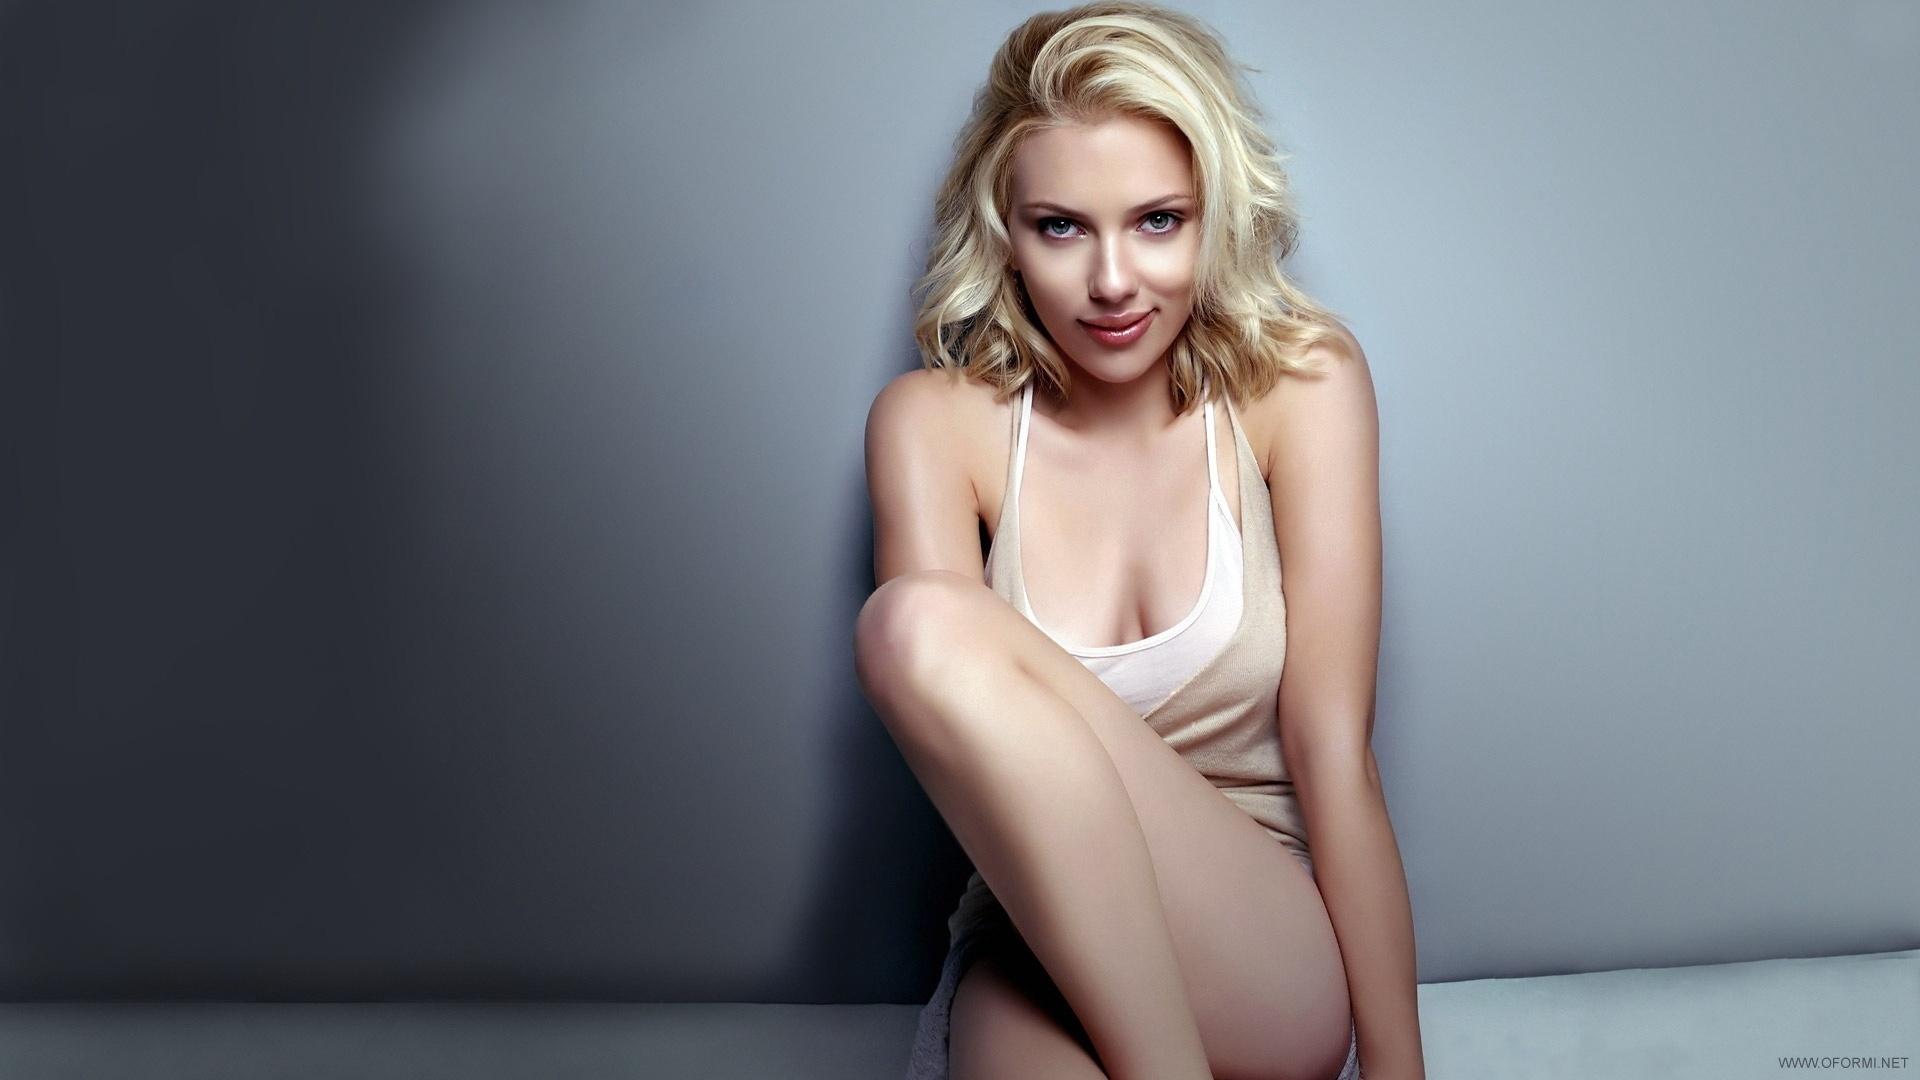 Scarlett Johansson Sexy Wallpapers